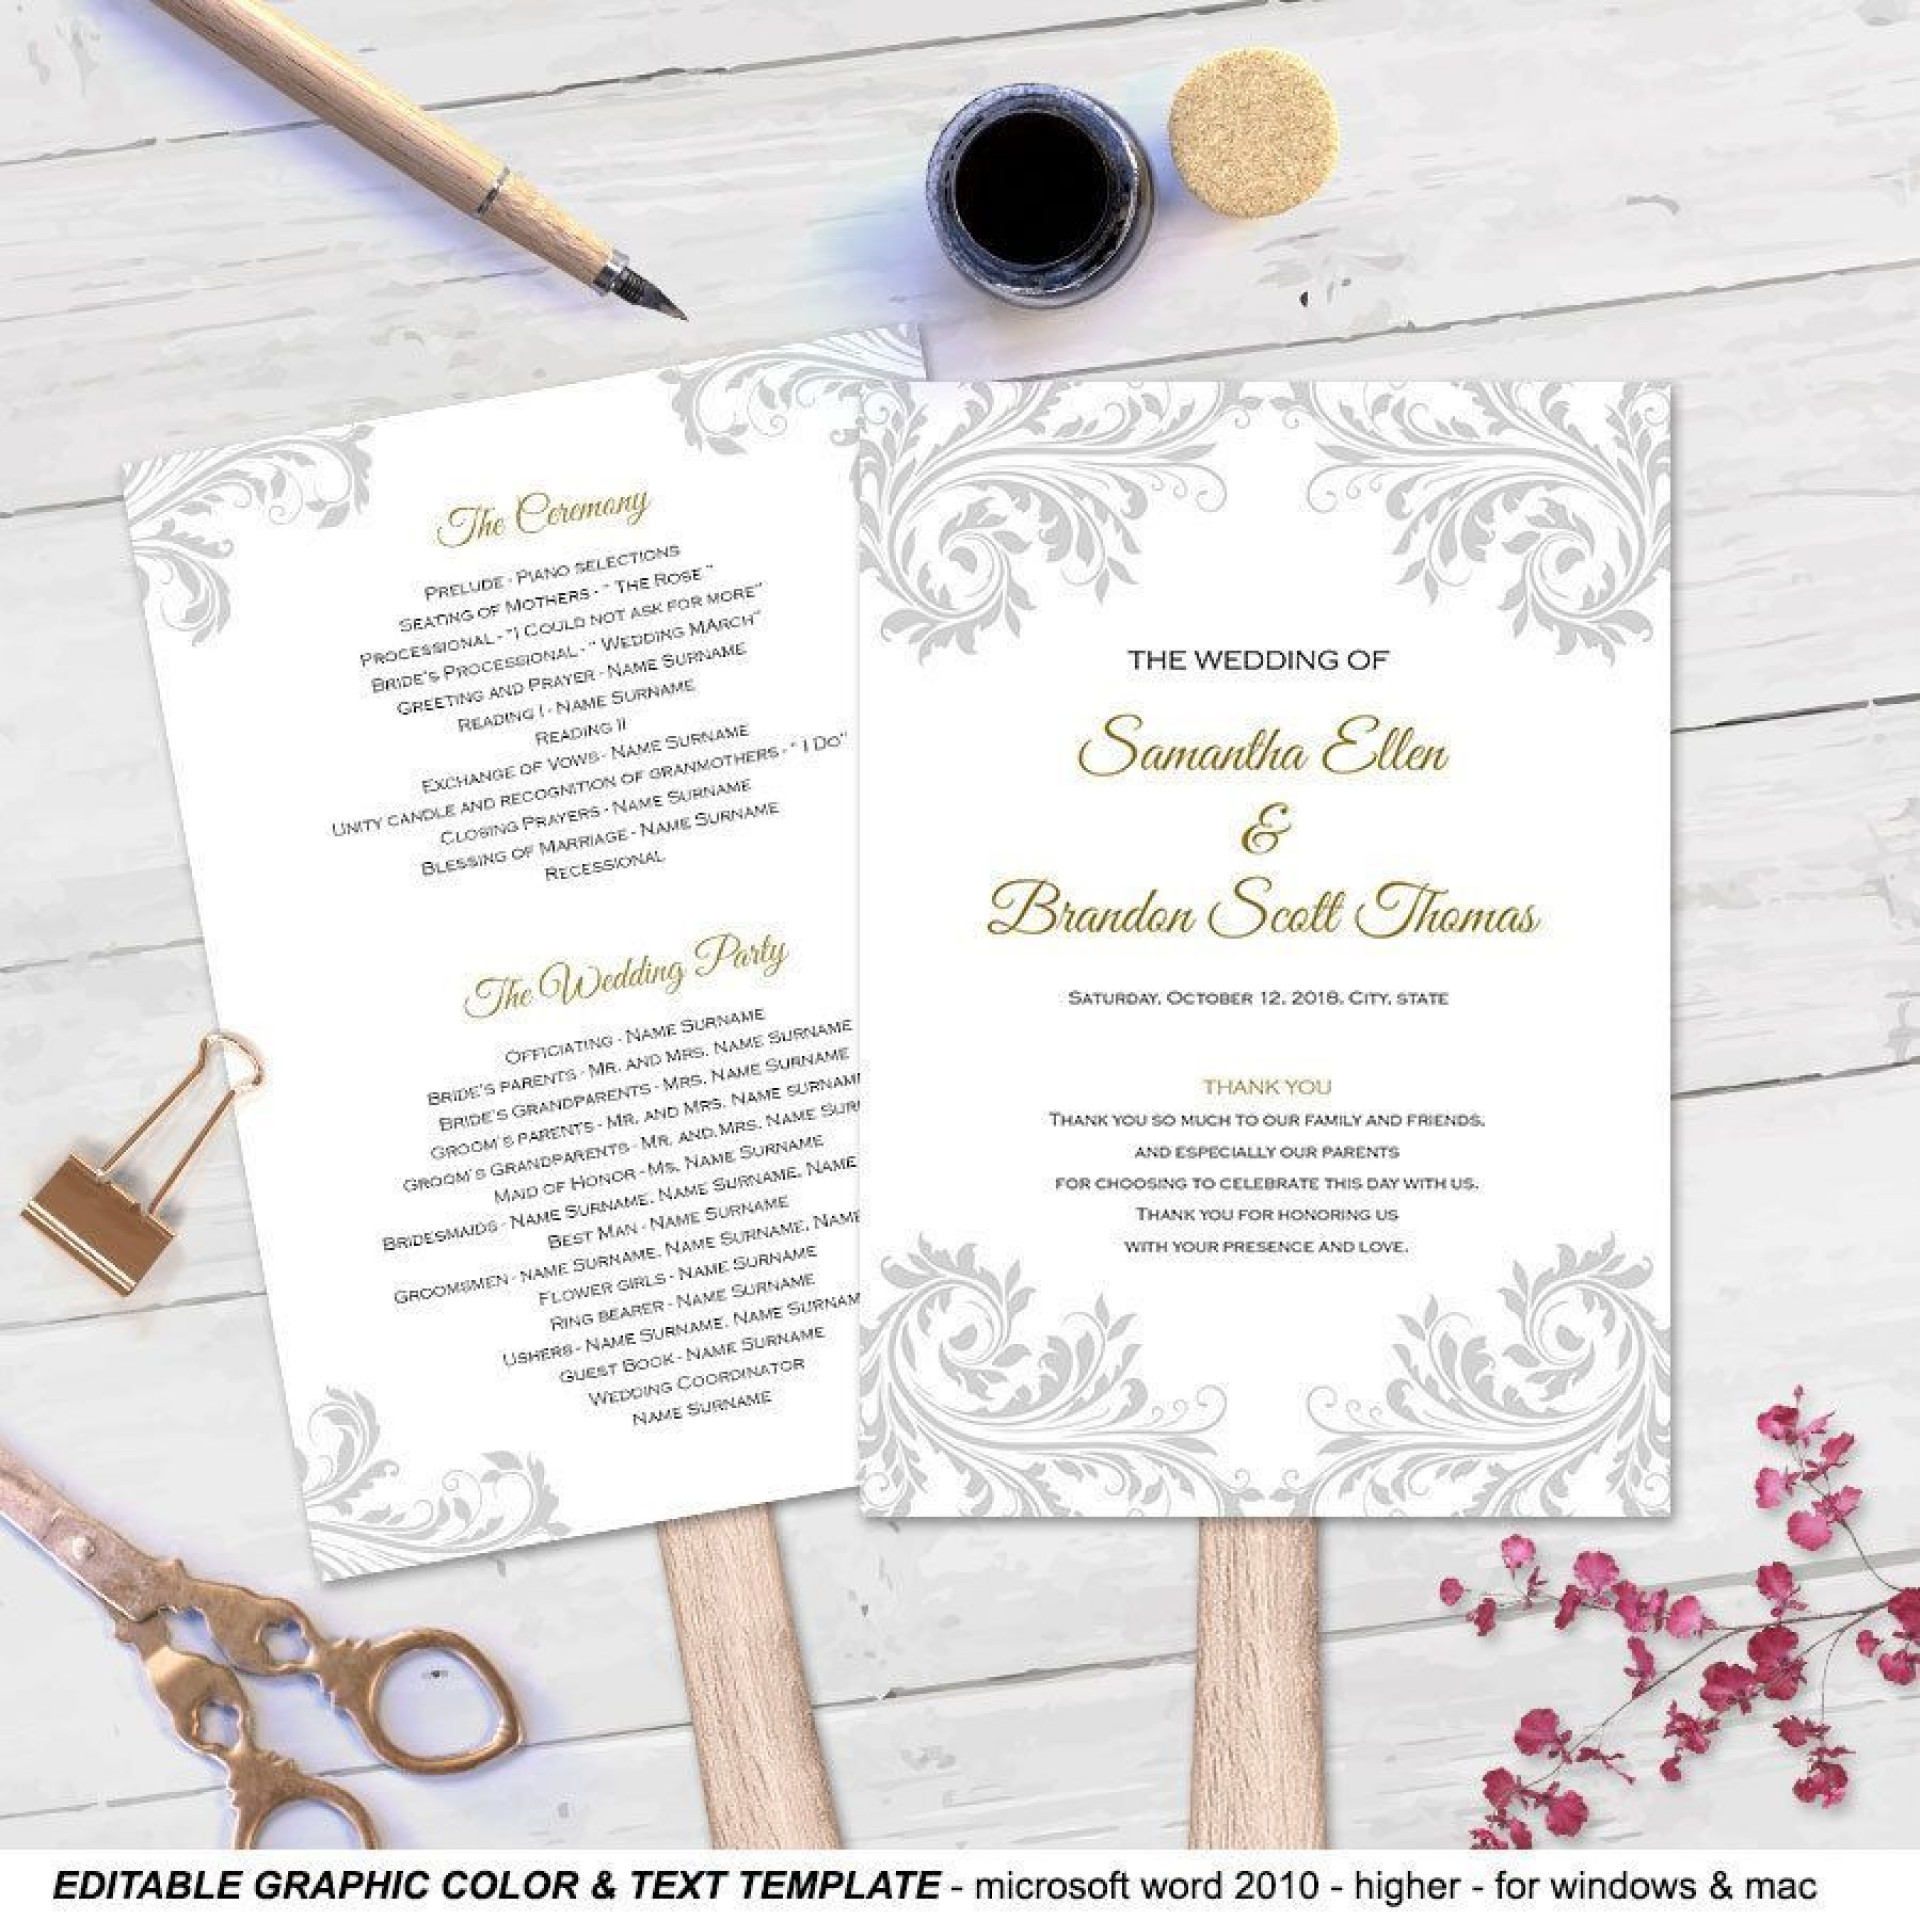 000 Shocking Free Wedding Program Fan Template High Definition  Templates Printable Paddle Word1920